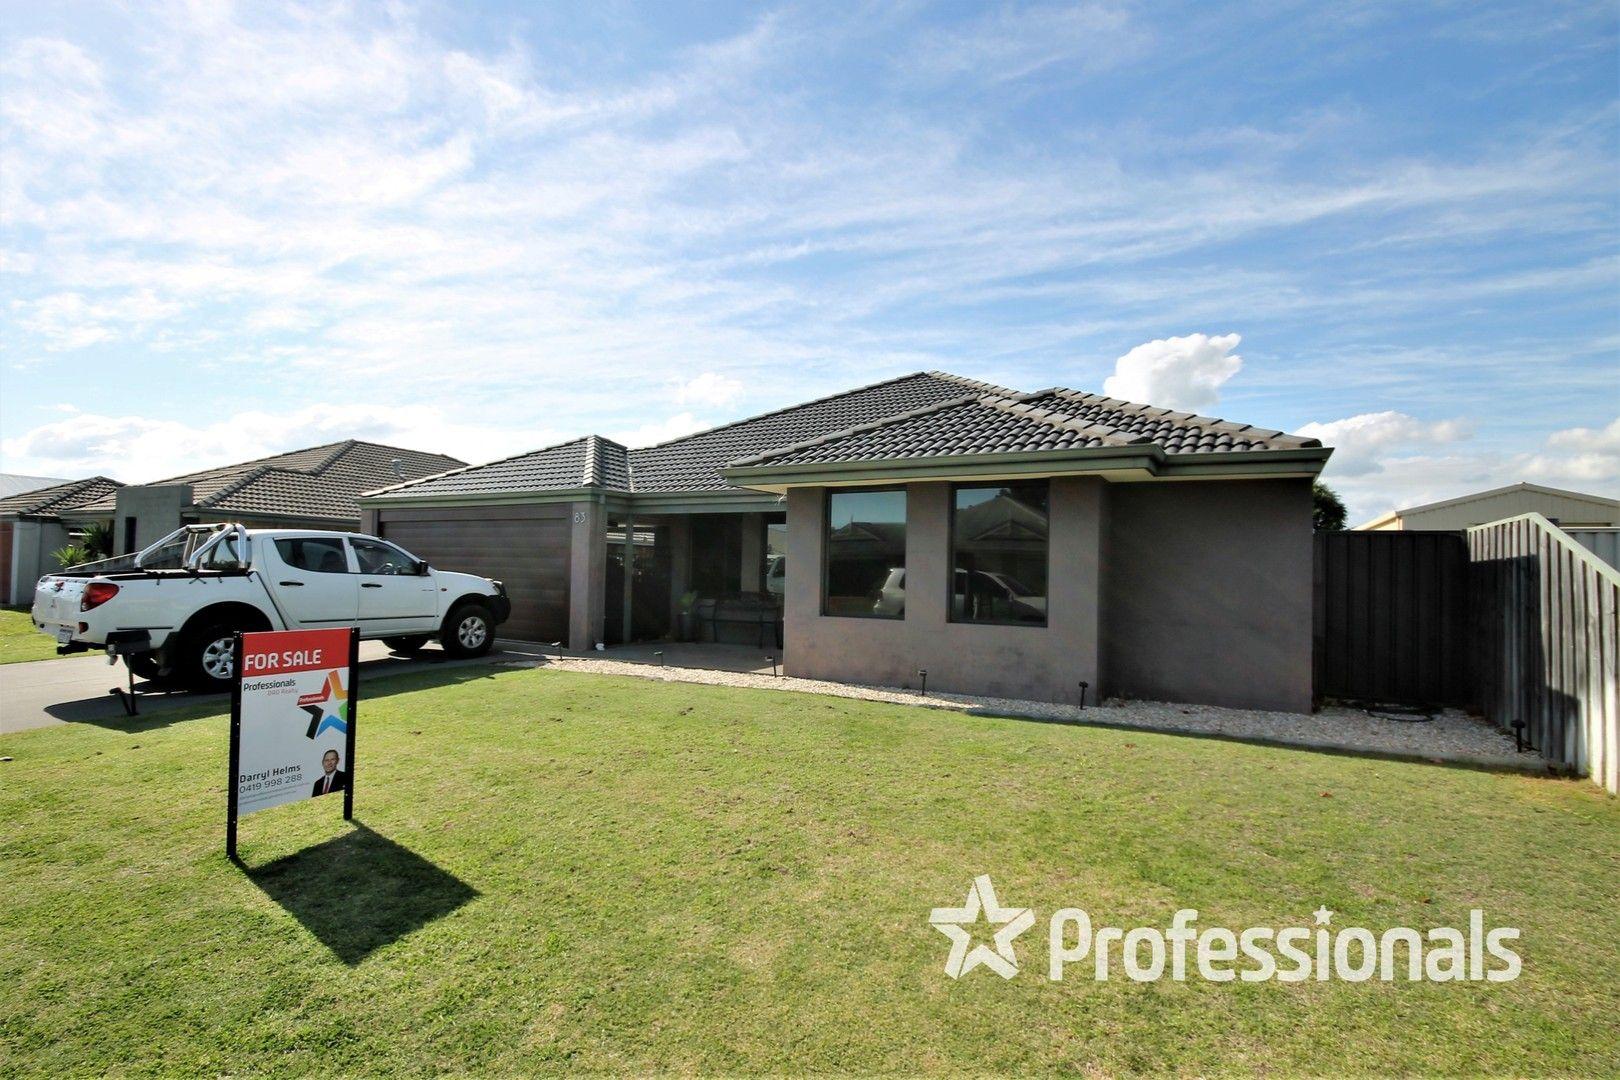 83 Burleigh Drive, Australind WA 6233, Image 0